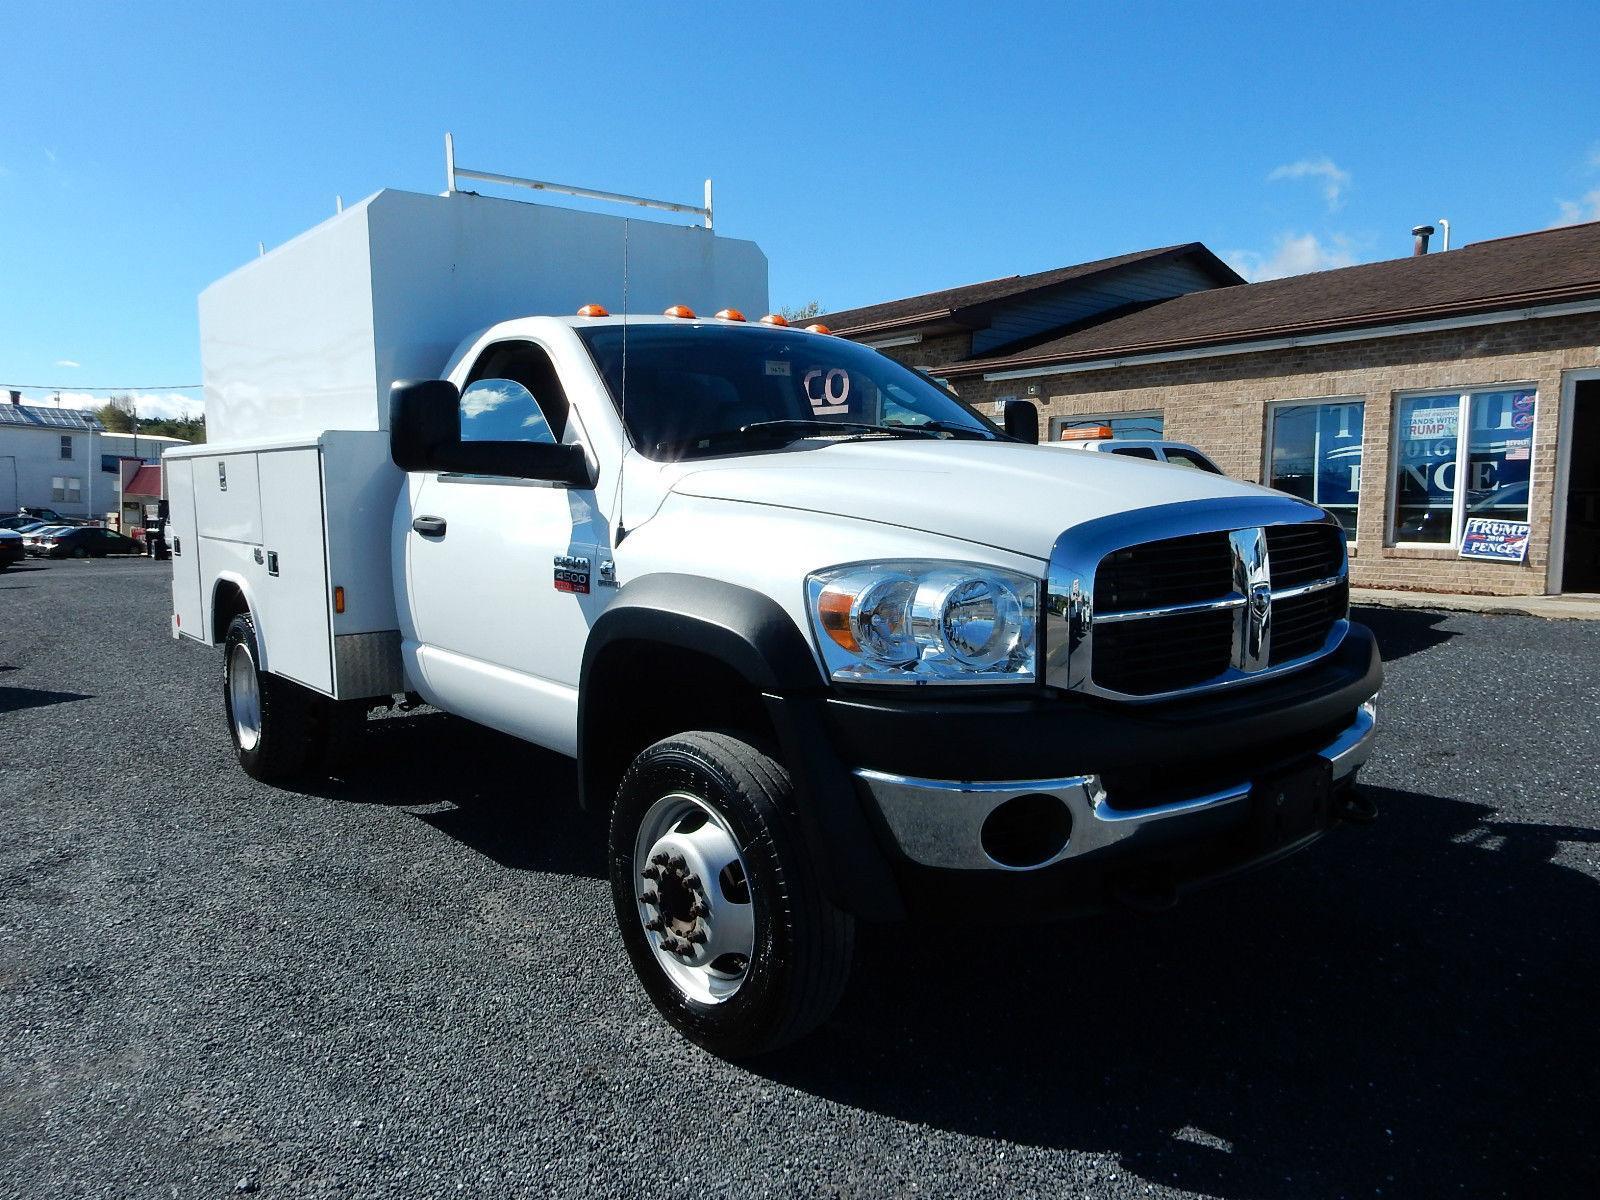 Craigslist Washington Dc Cars And Trucks >> Reading Cars Trucks Craigslist | Autos Post